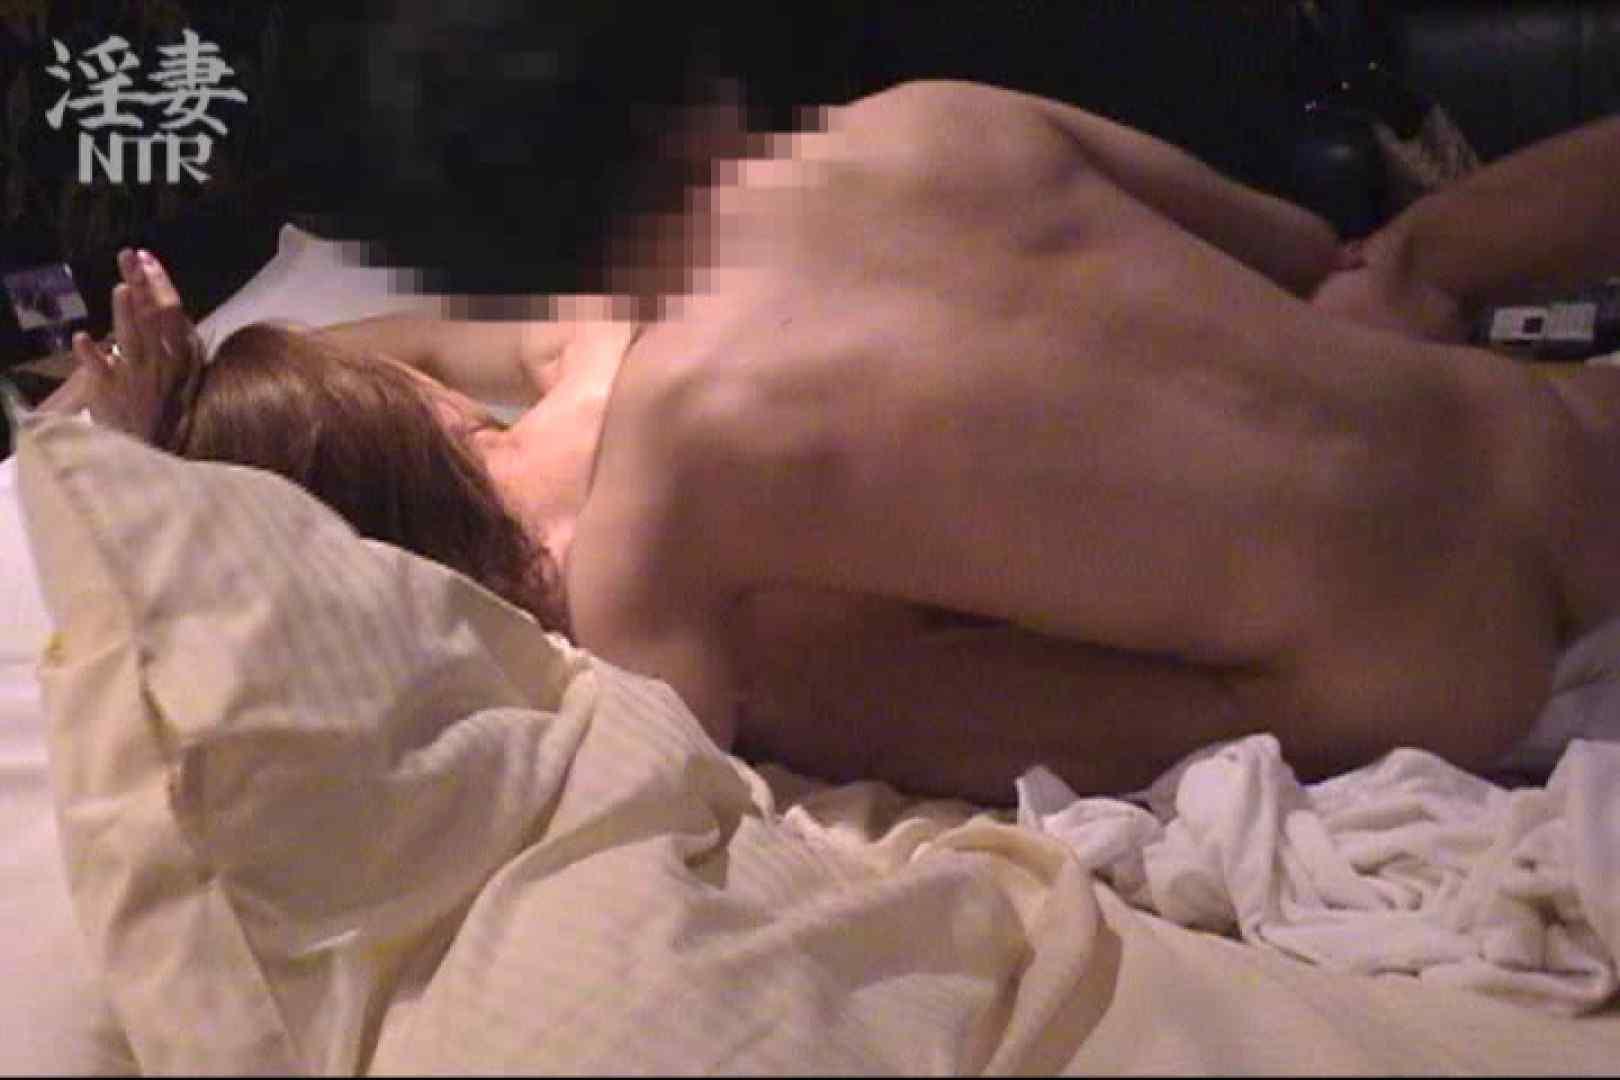 淫乱彩女 麻優里 28歳の単独男性の他人棒 2 他人棒   性欲  71pic 28